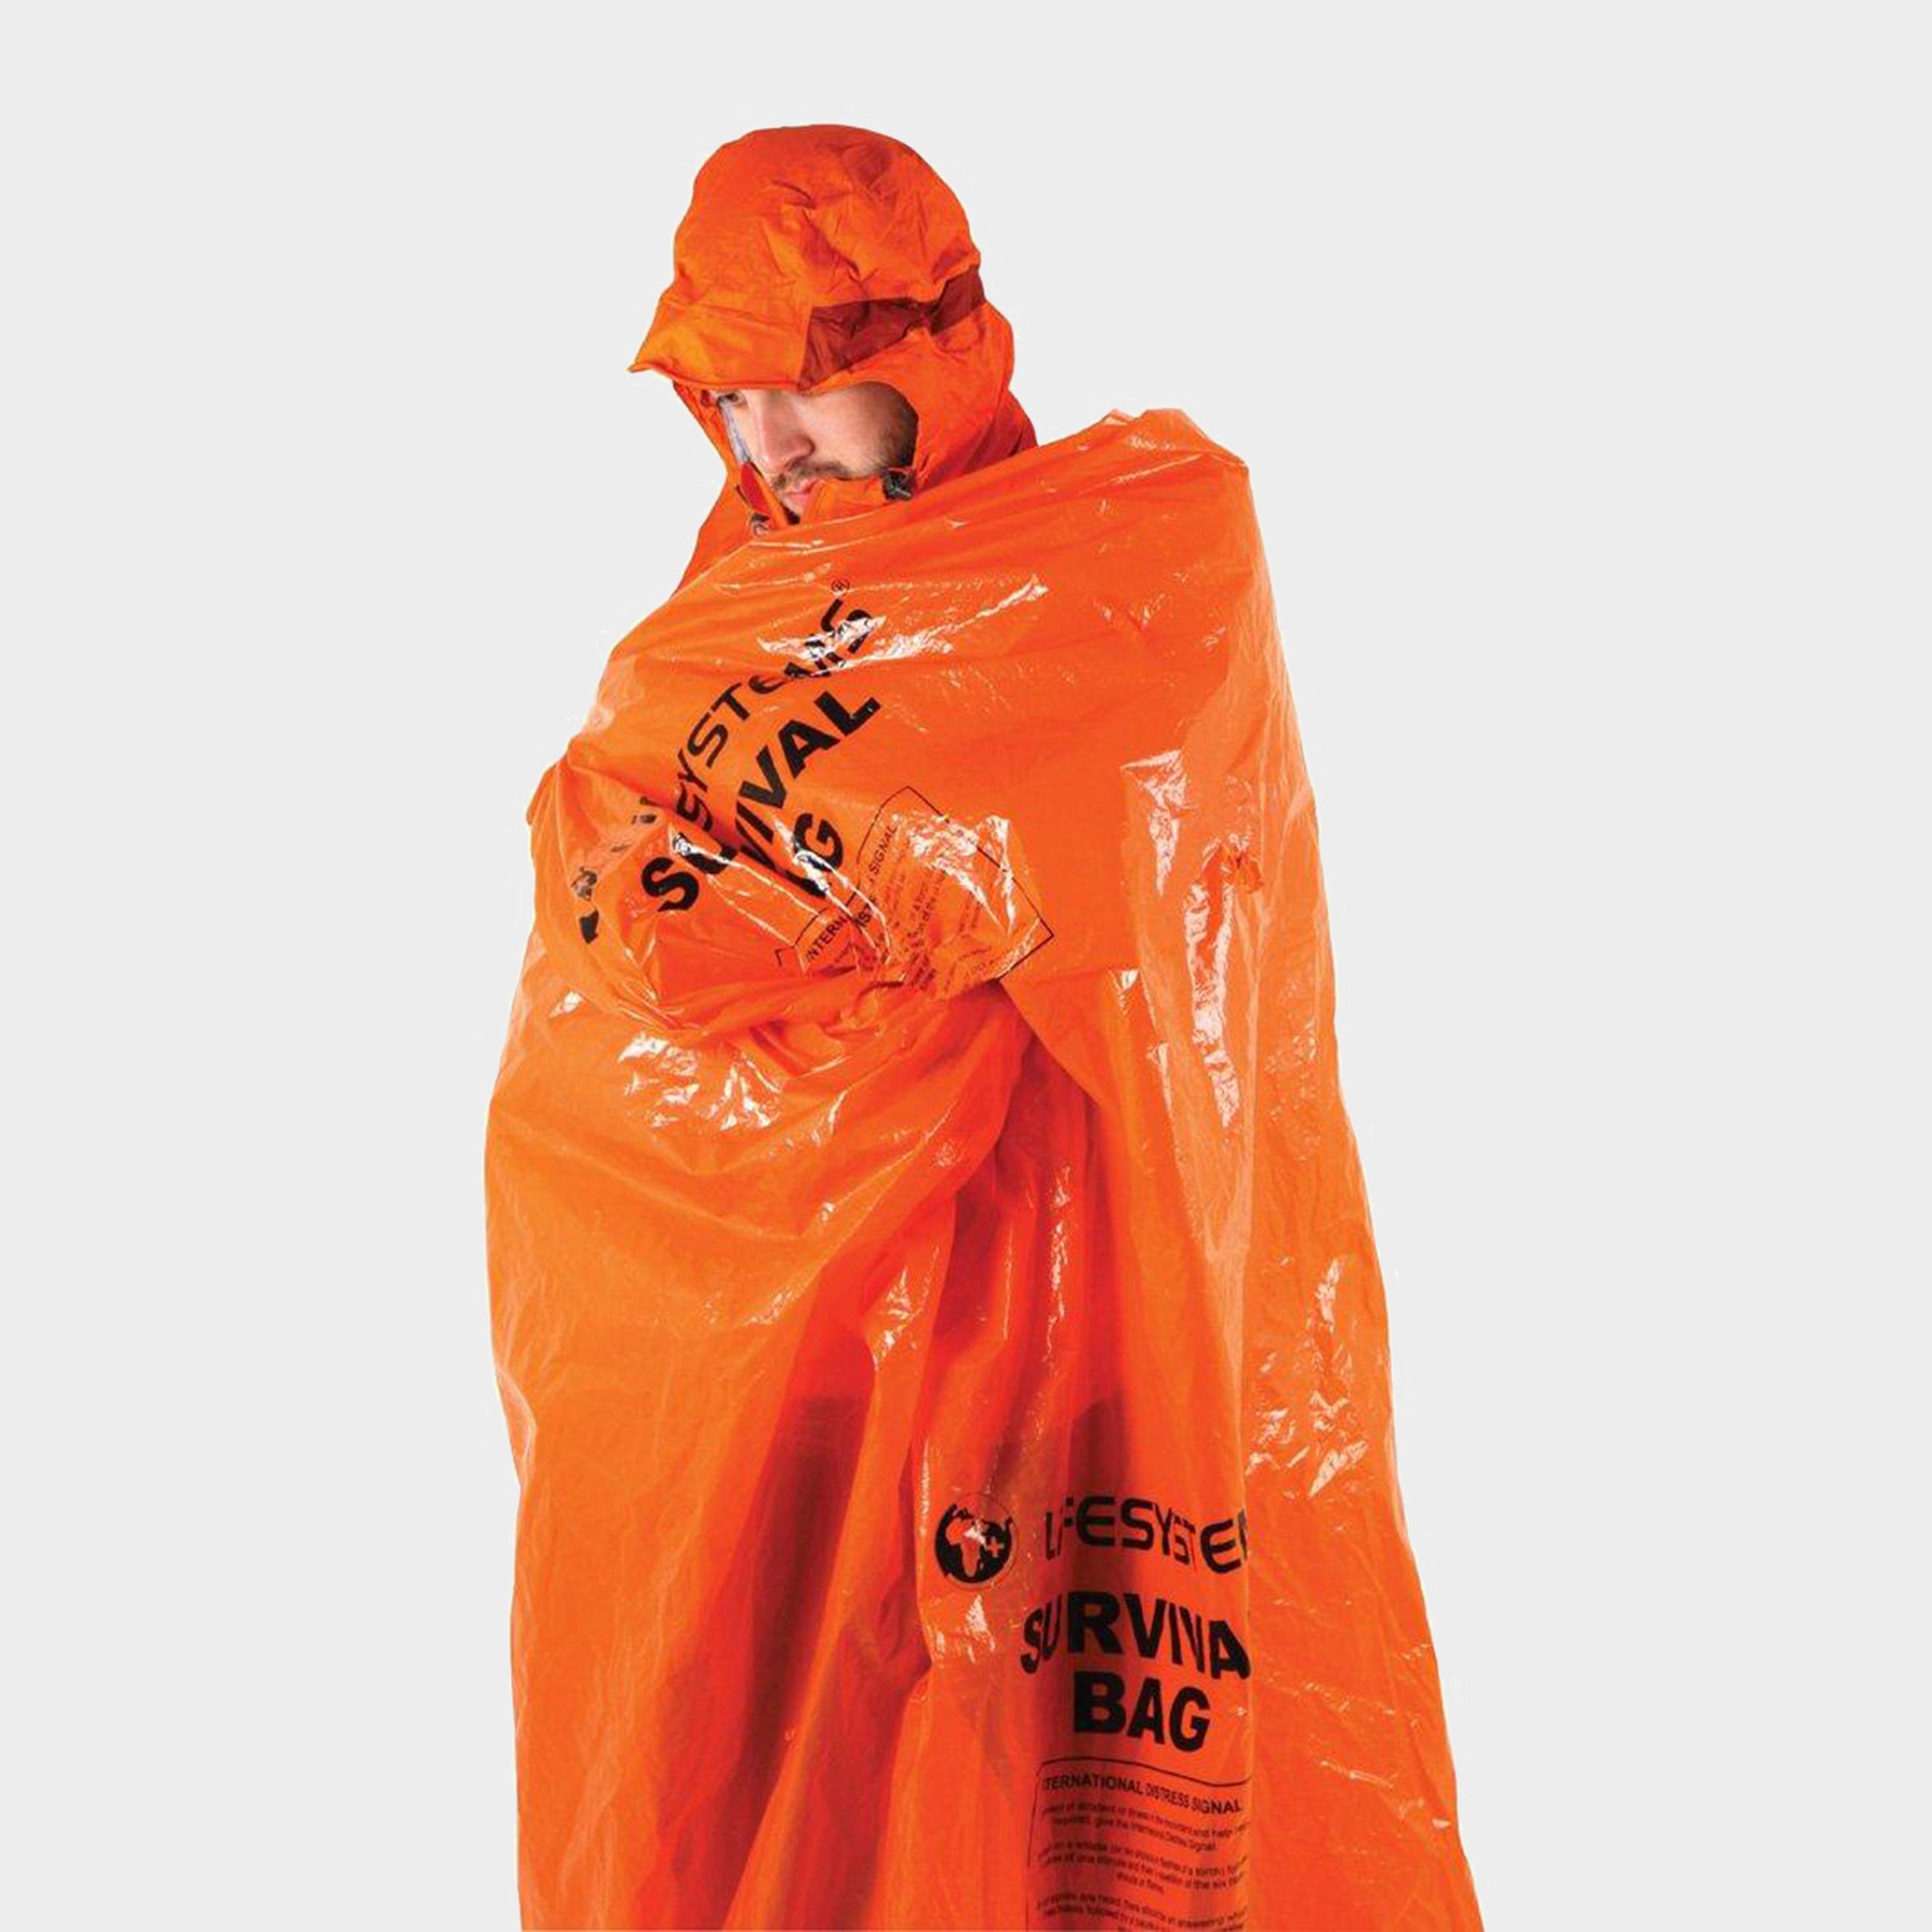 Lifesystems Survival Bag - Orange/assorted  Orange/assorted